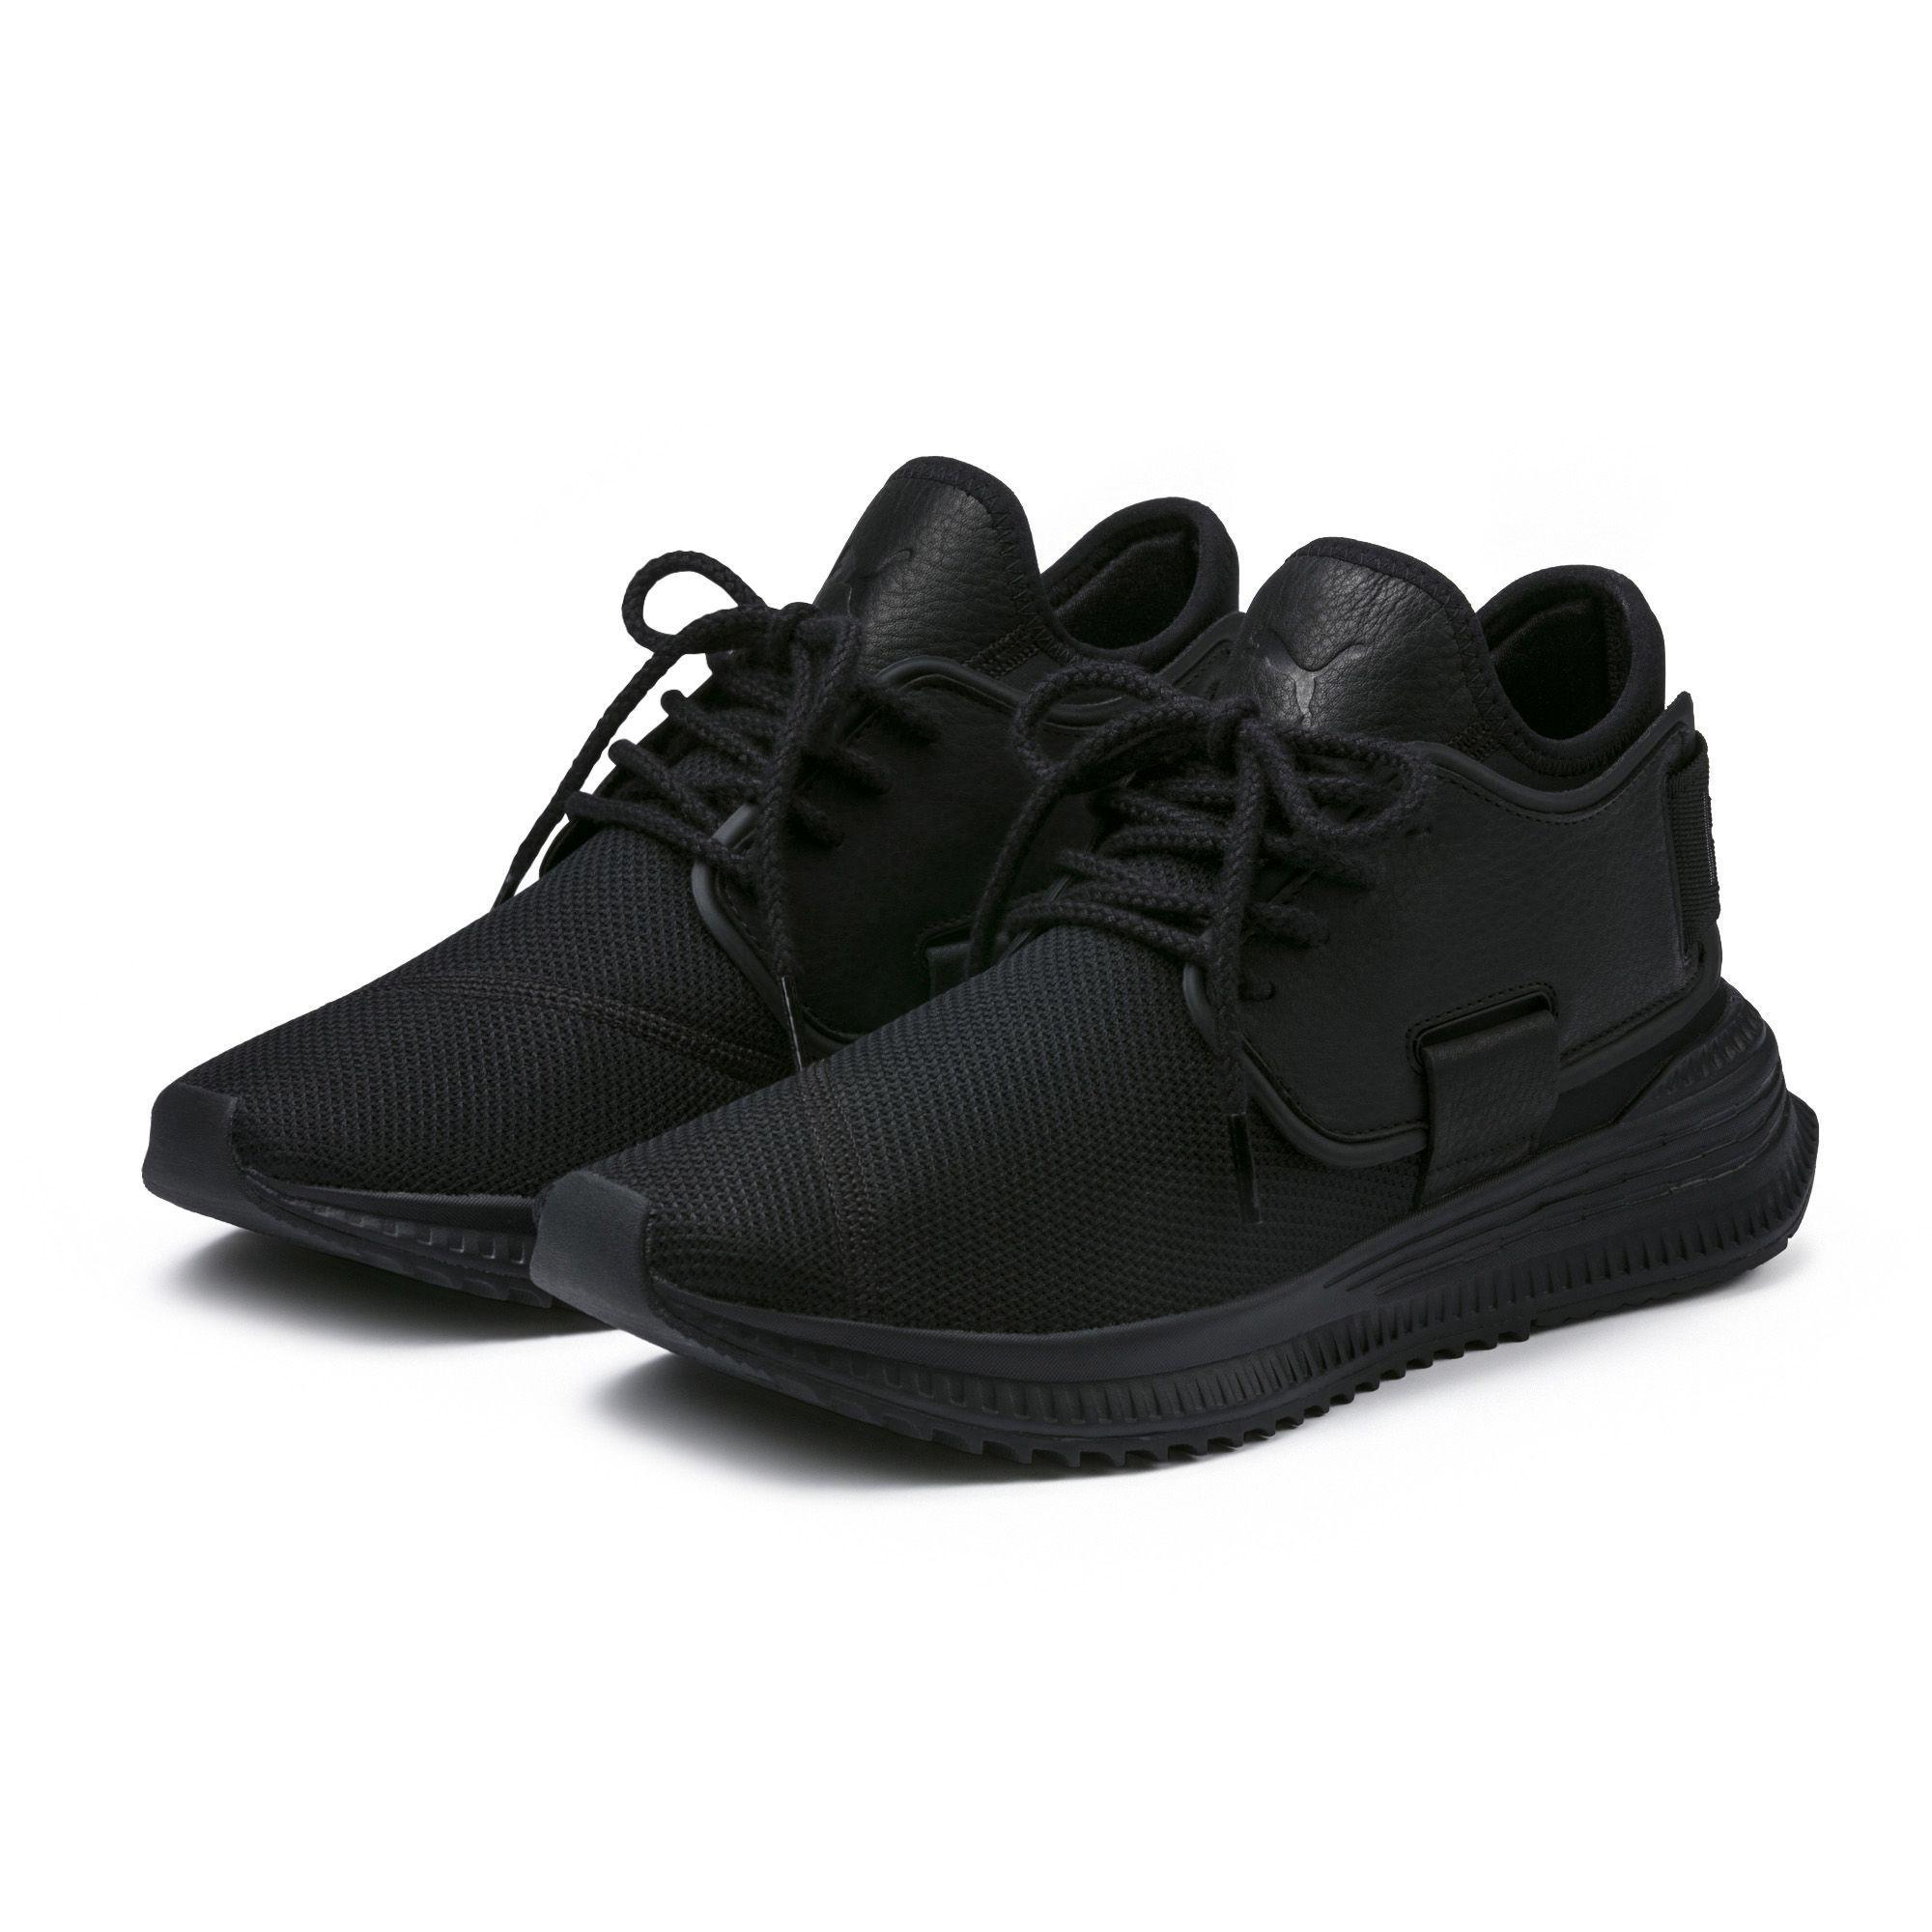 PUMA Neoprene Avid Monolith Sneakers in